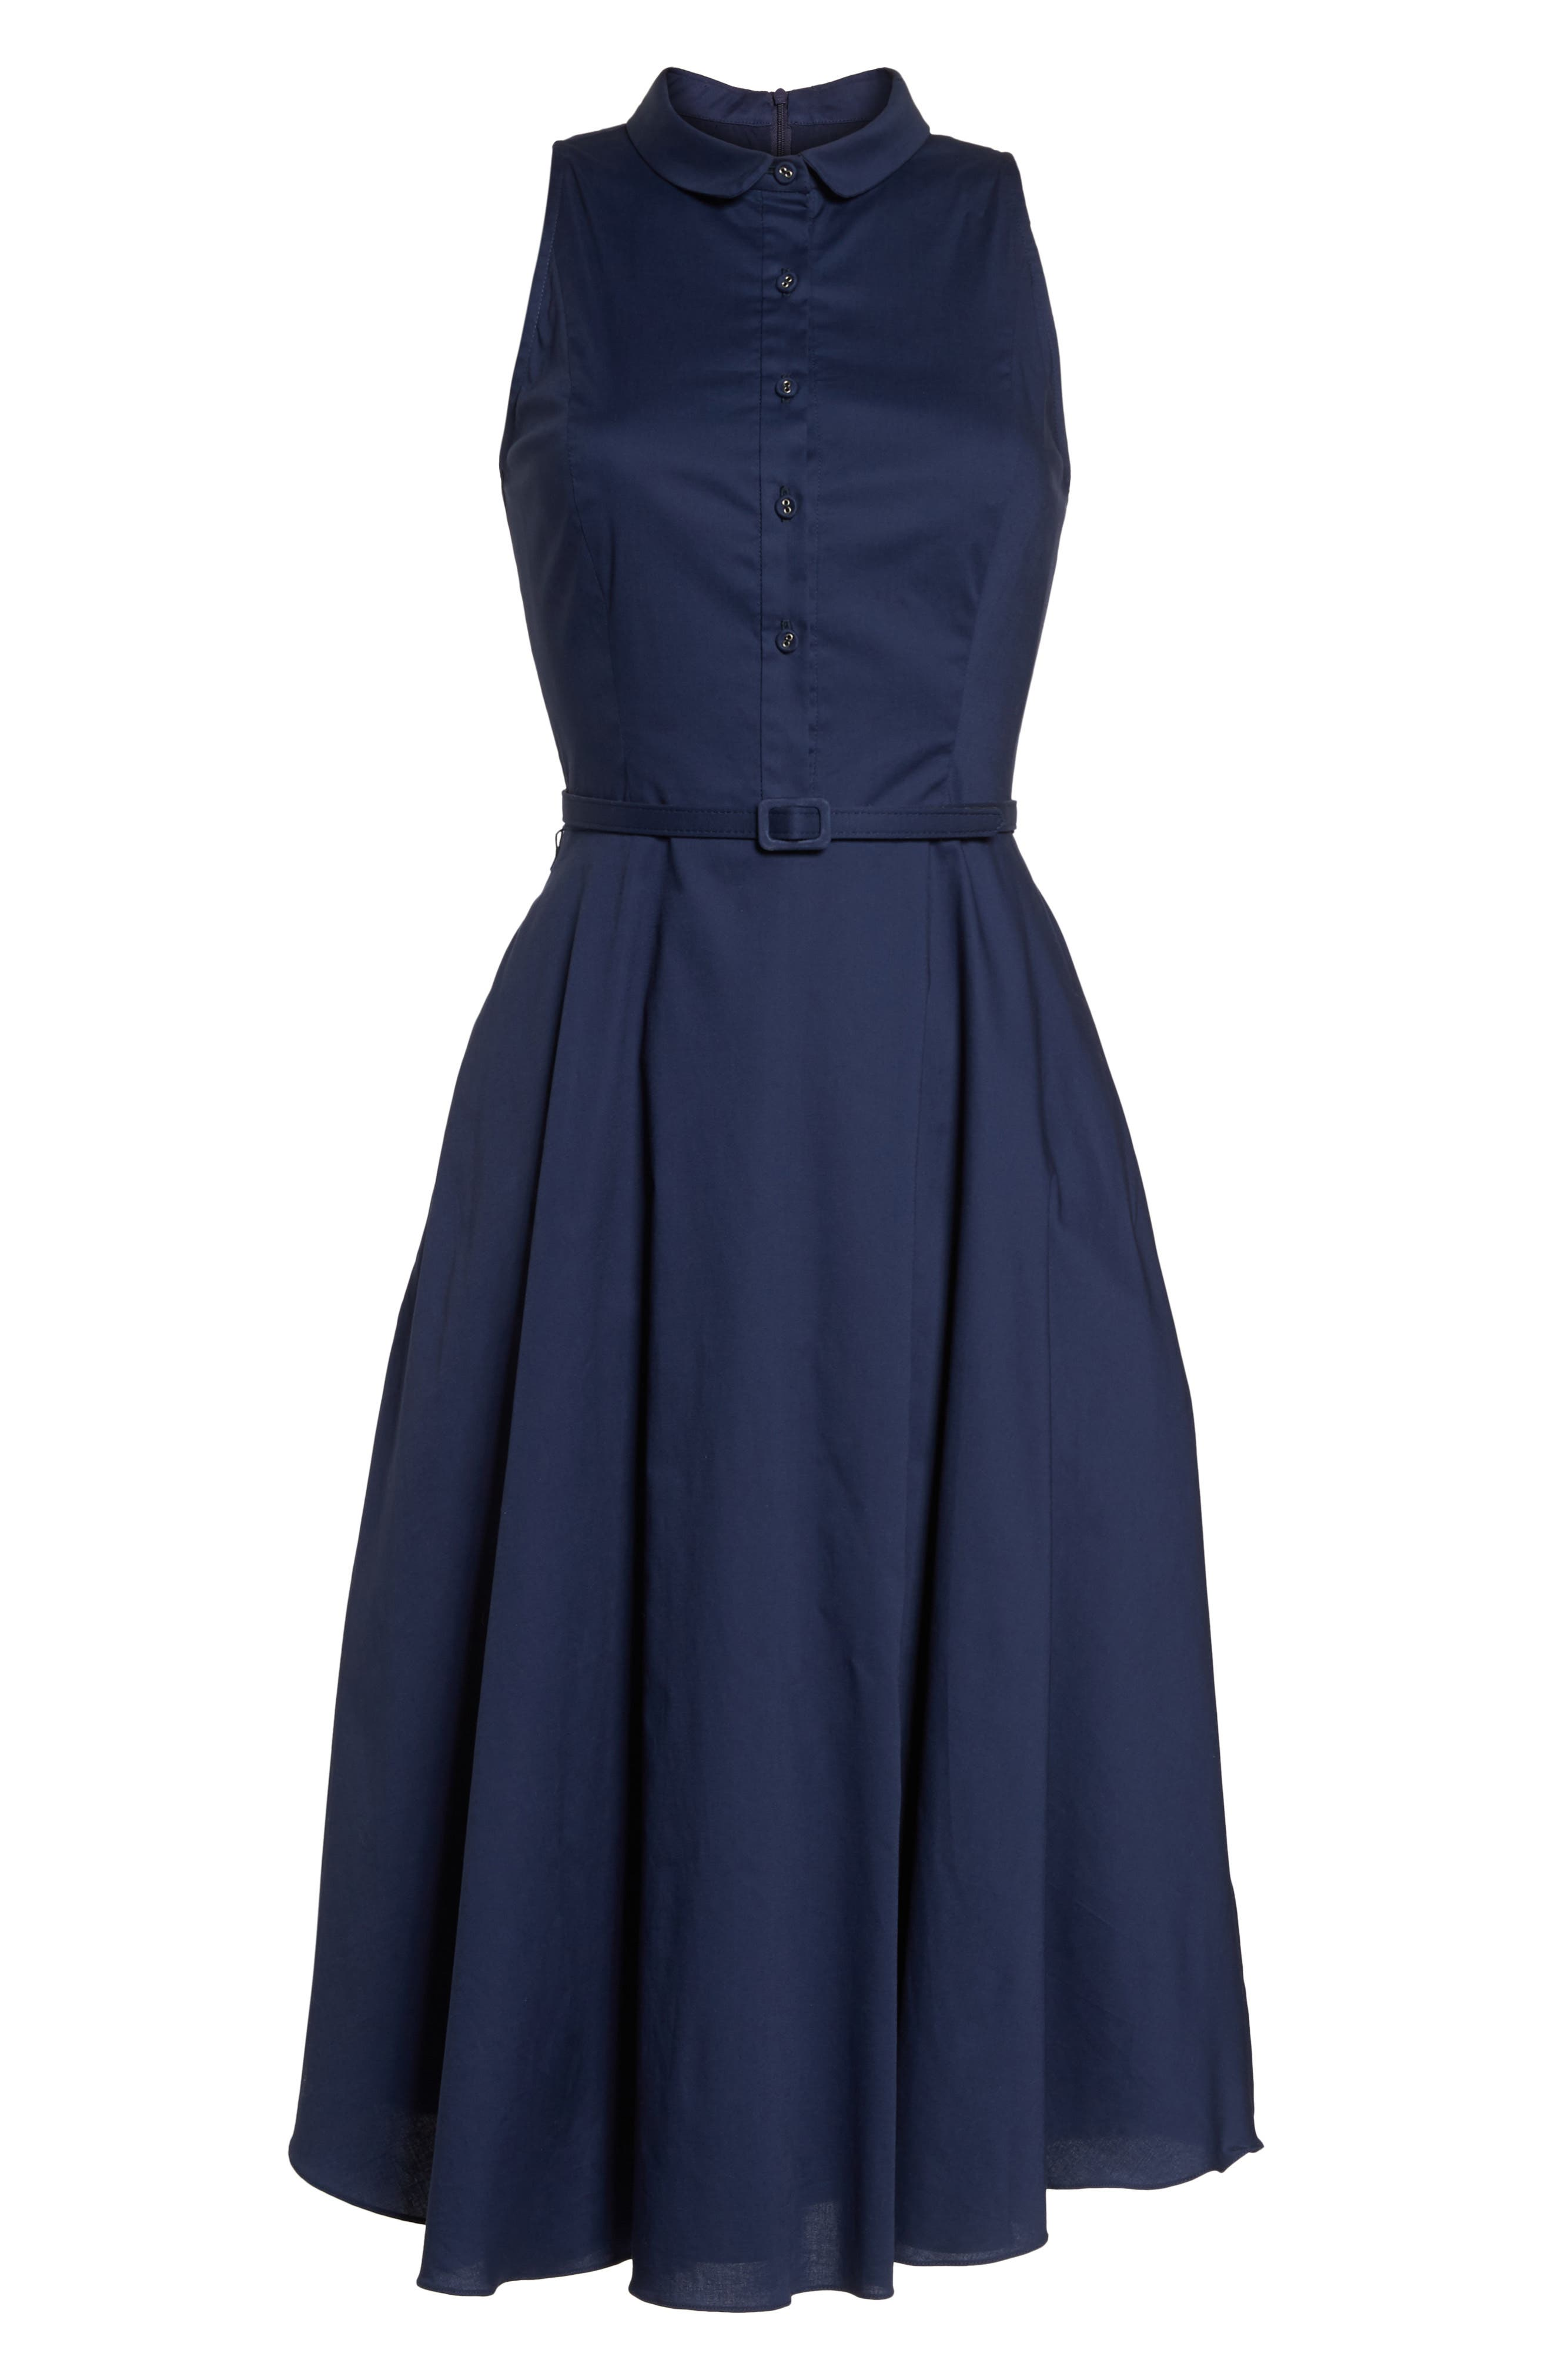 Rose Sleeveless Cotton Poplin Shirtdress,                             Alternate thumbnail 8, color,                             Navy